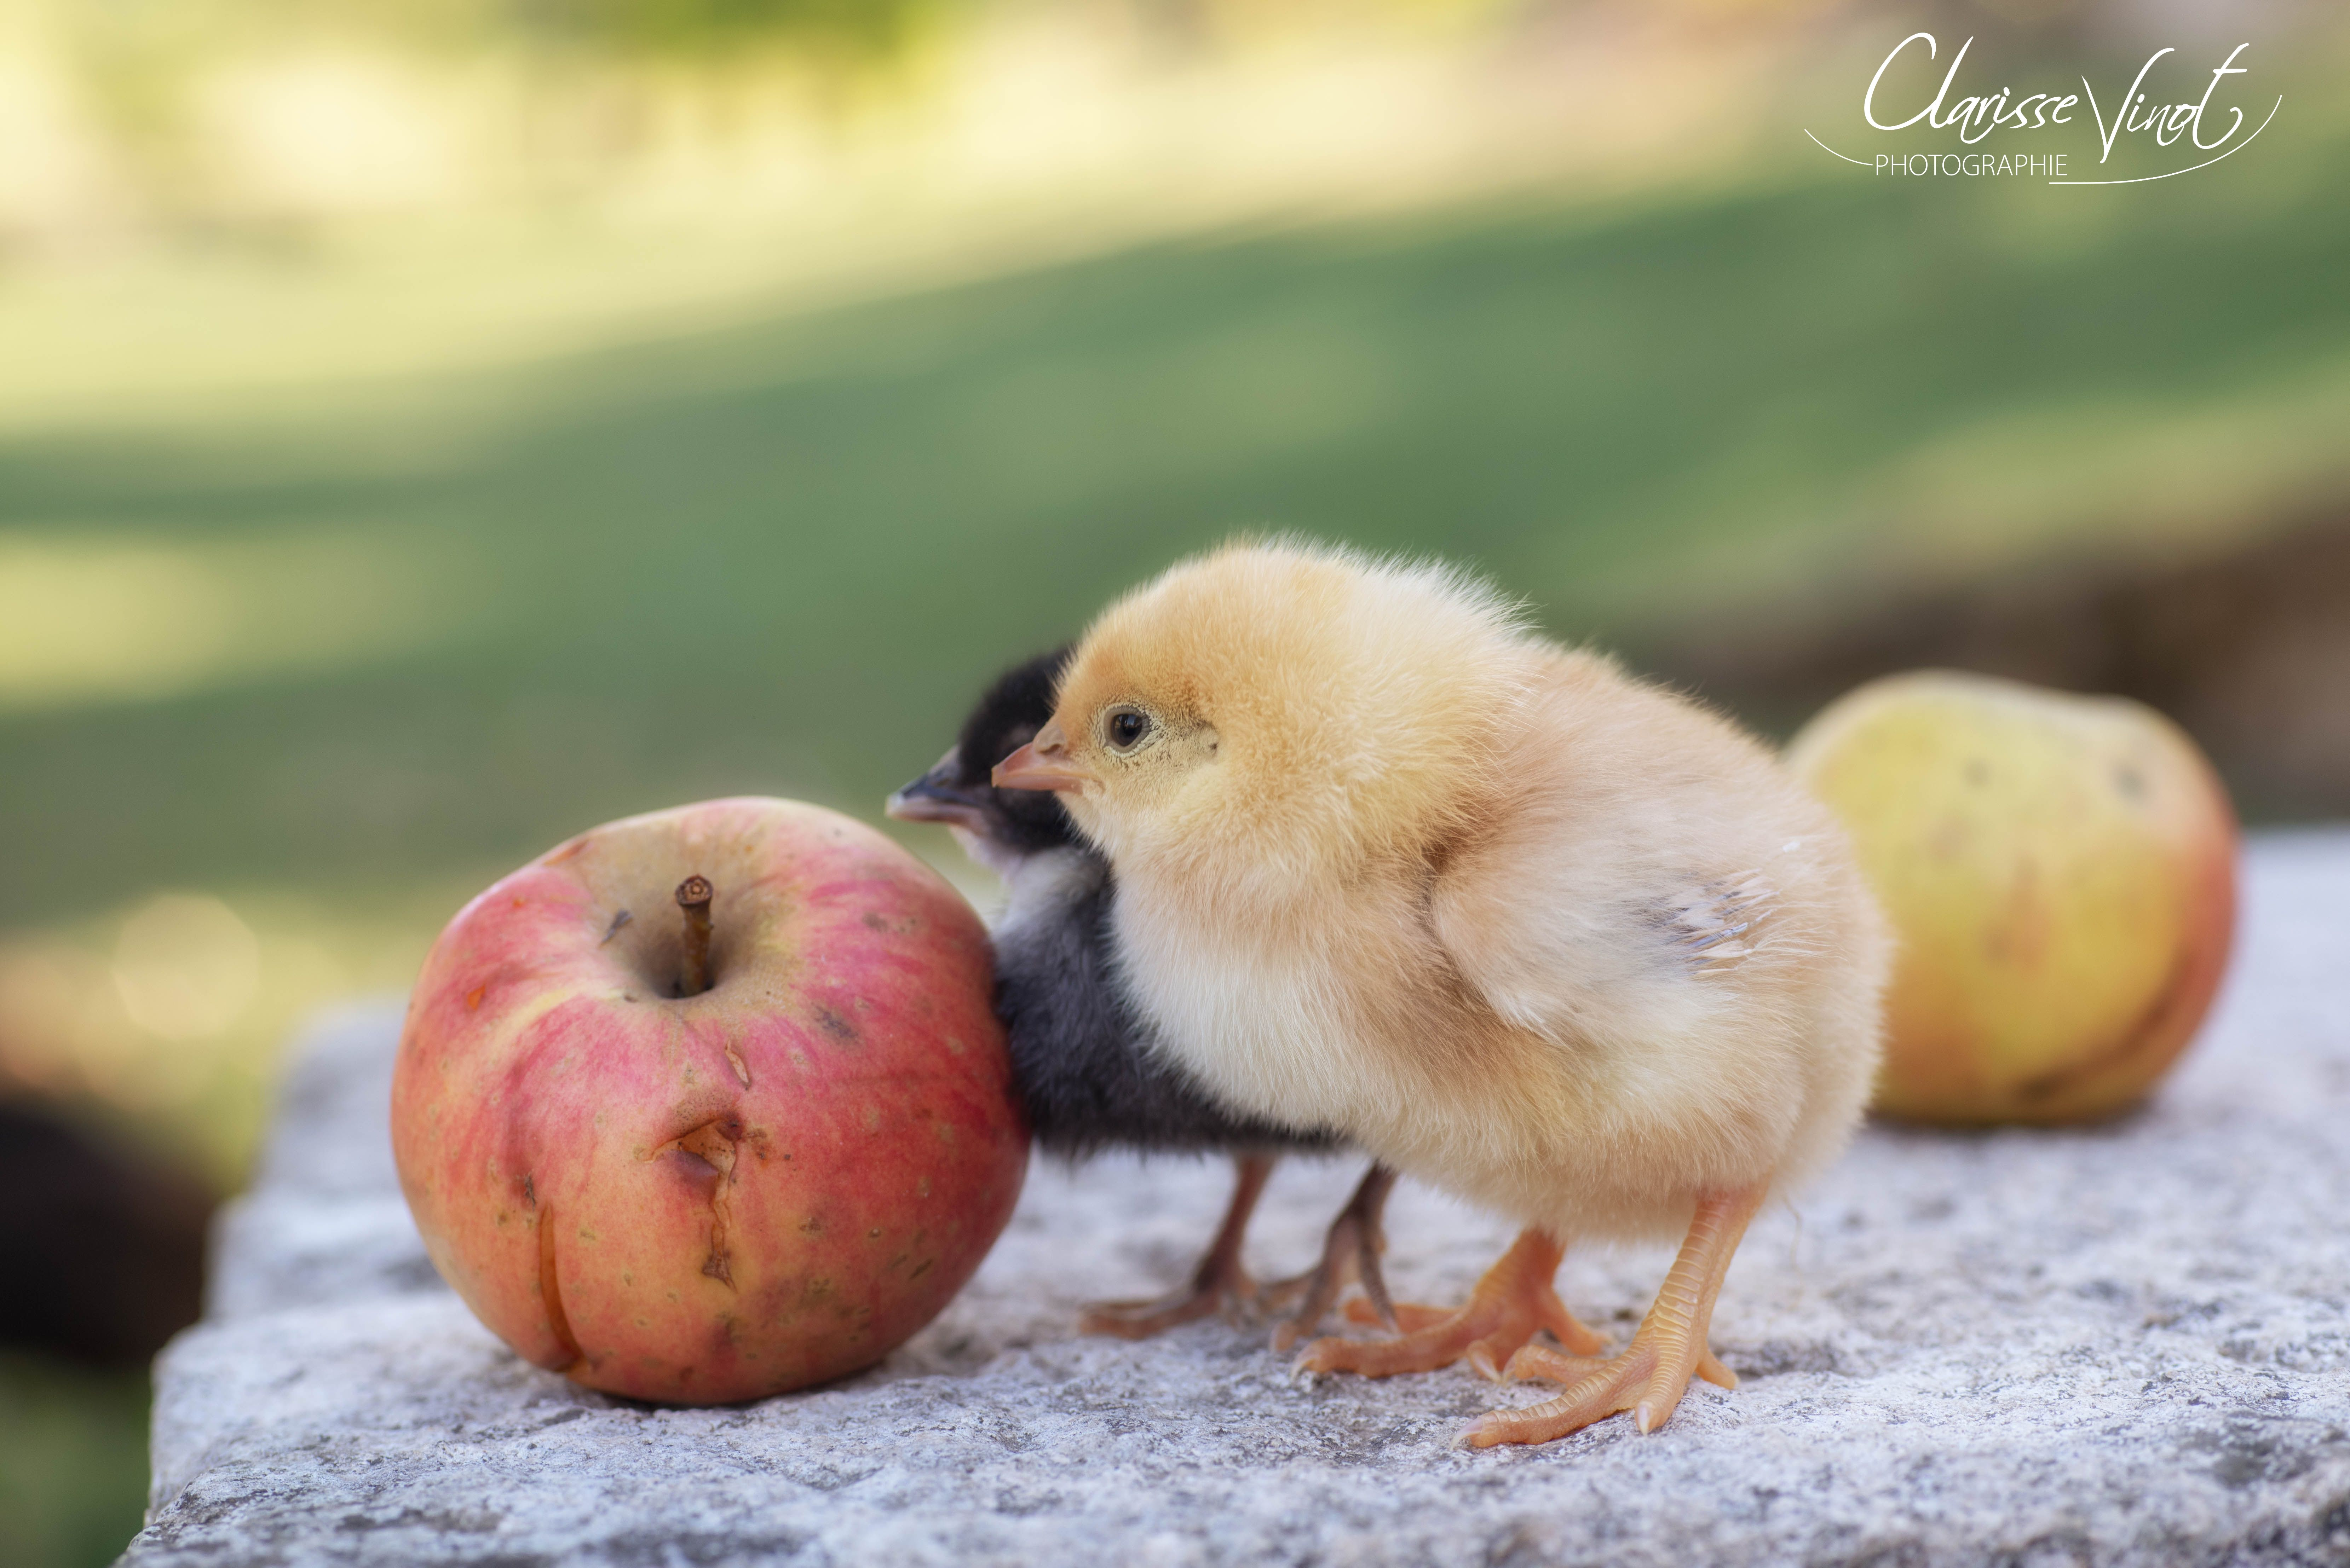 La pomme ou la poule